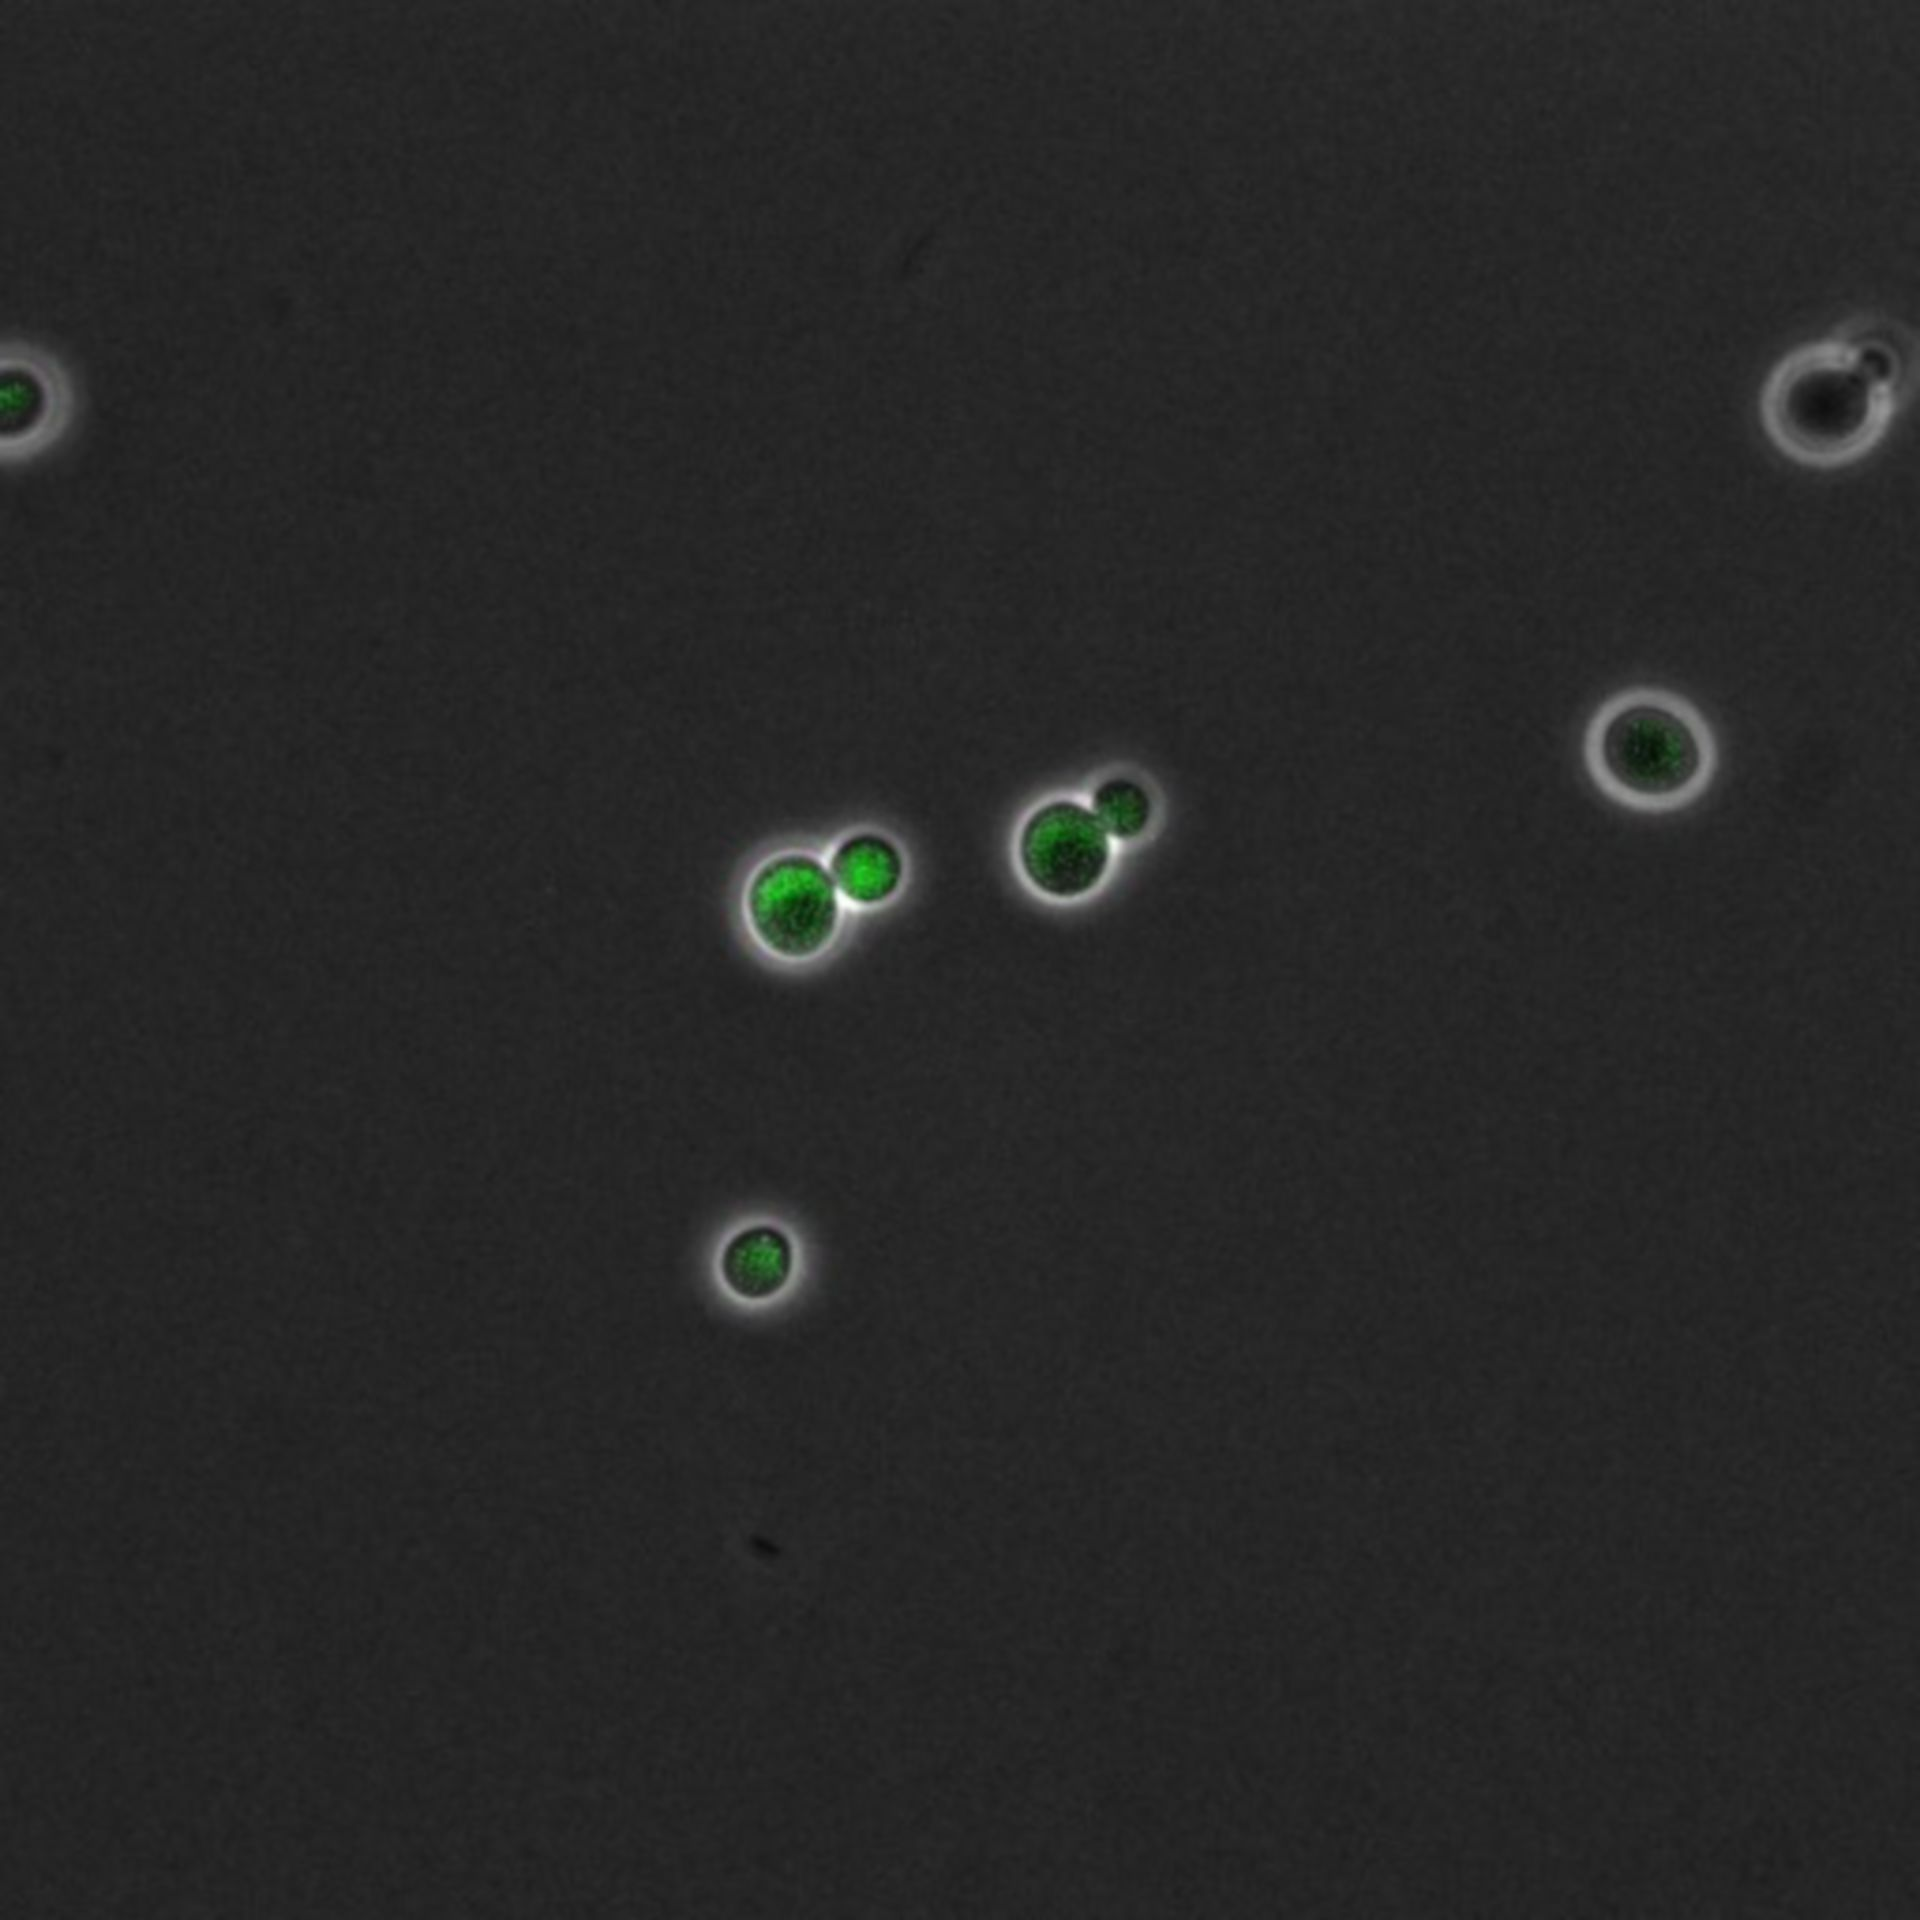 Saccharomyces cerevisiae (DNA replication preinitiation complex) - CIL:35667